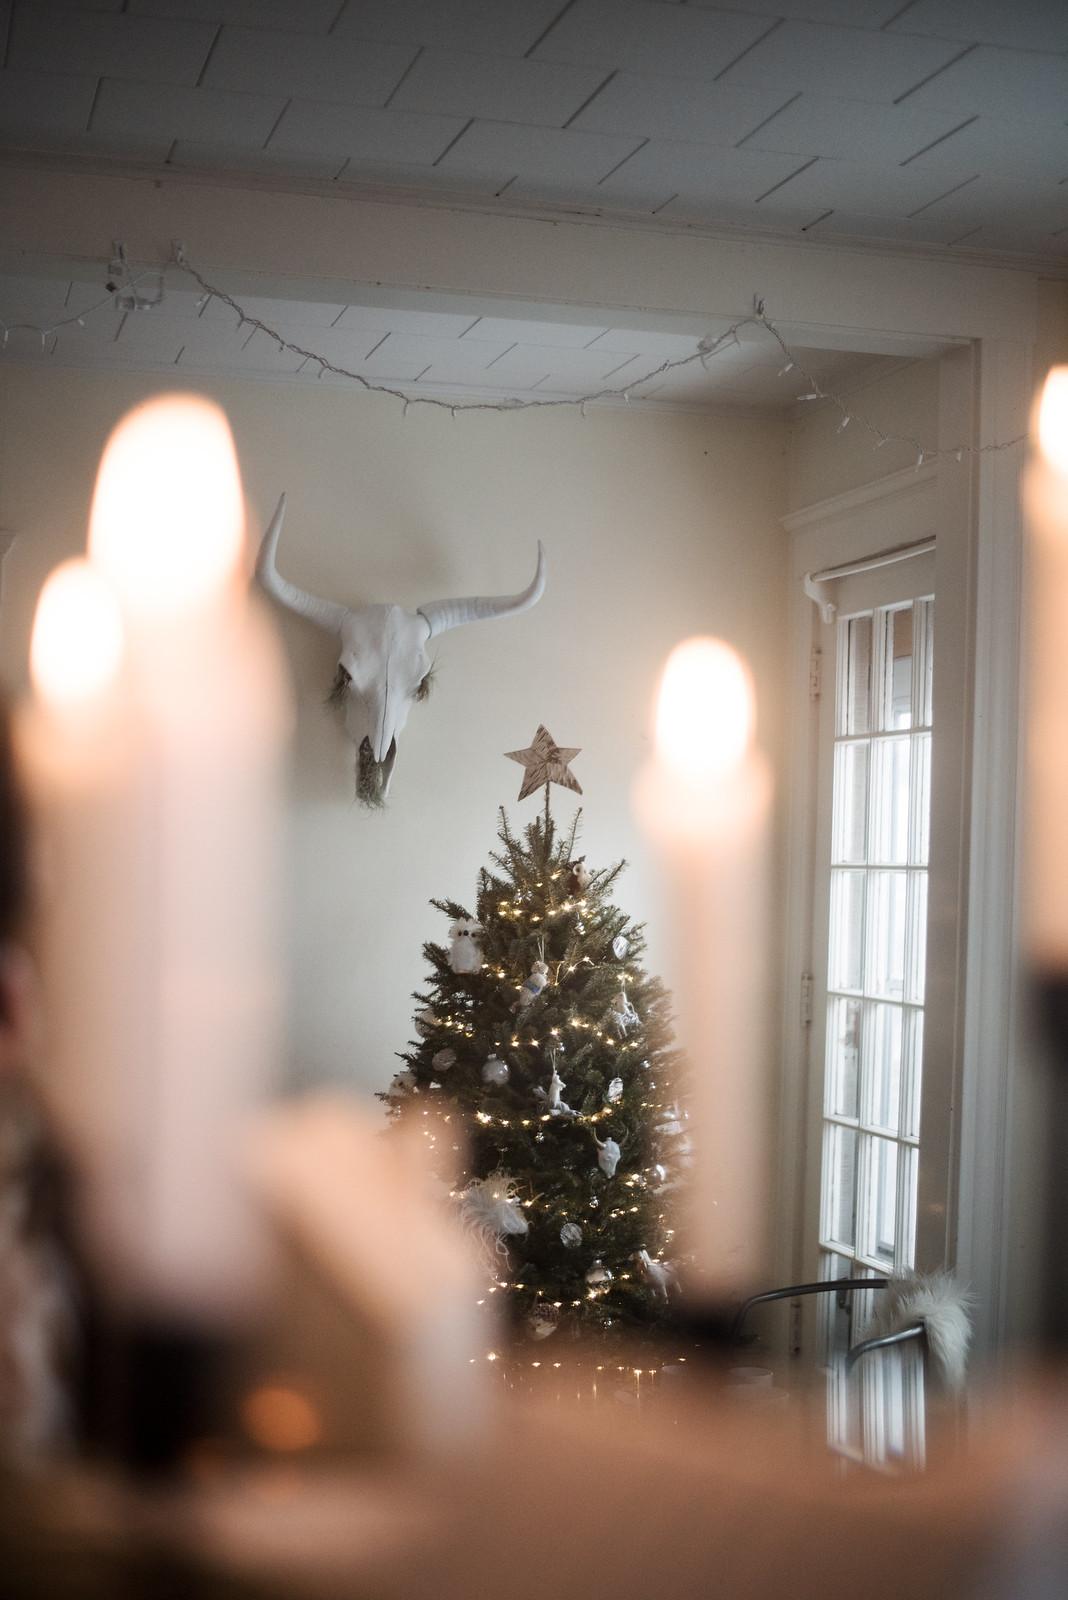 Bohemian Christmas on juliettelaura.blogspot.com